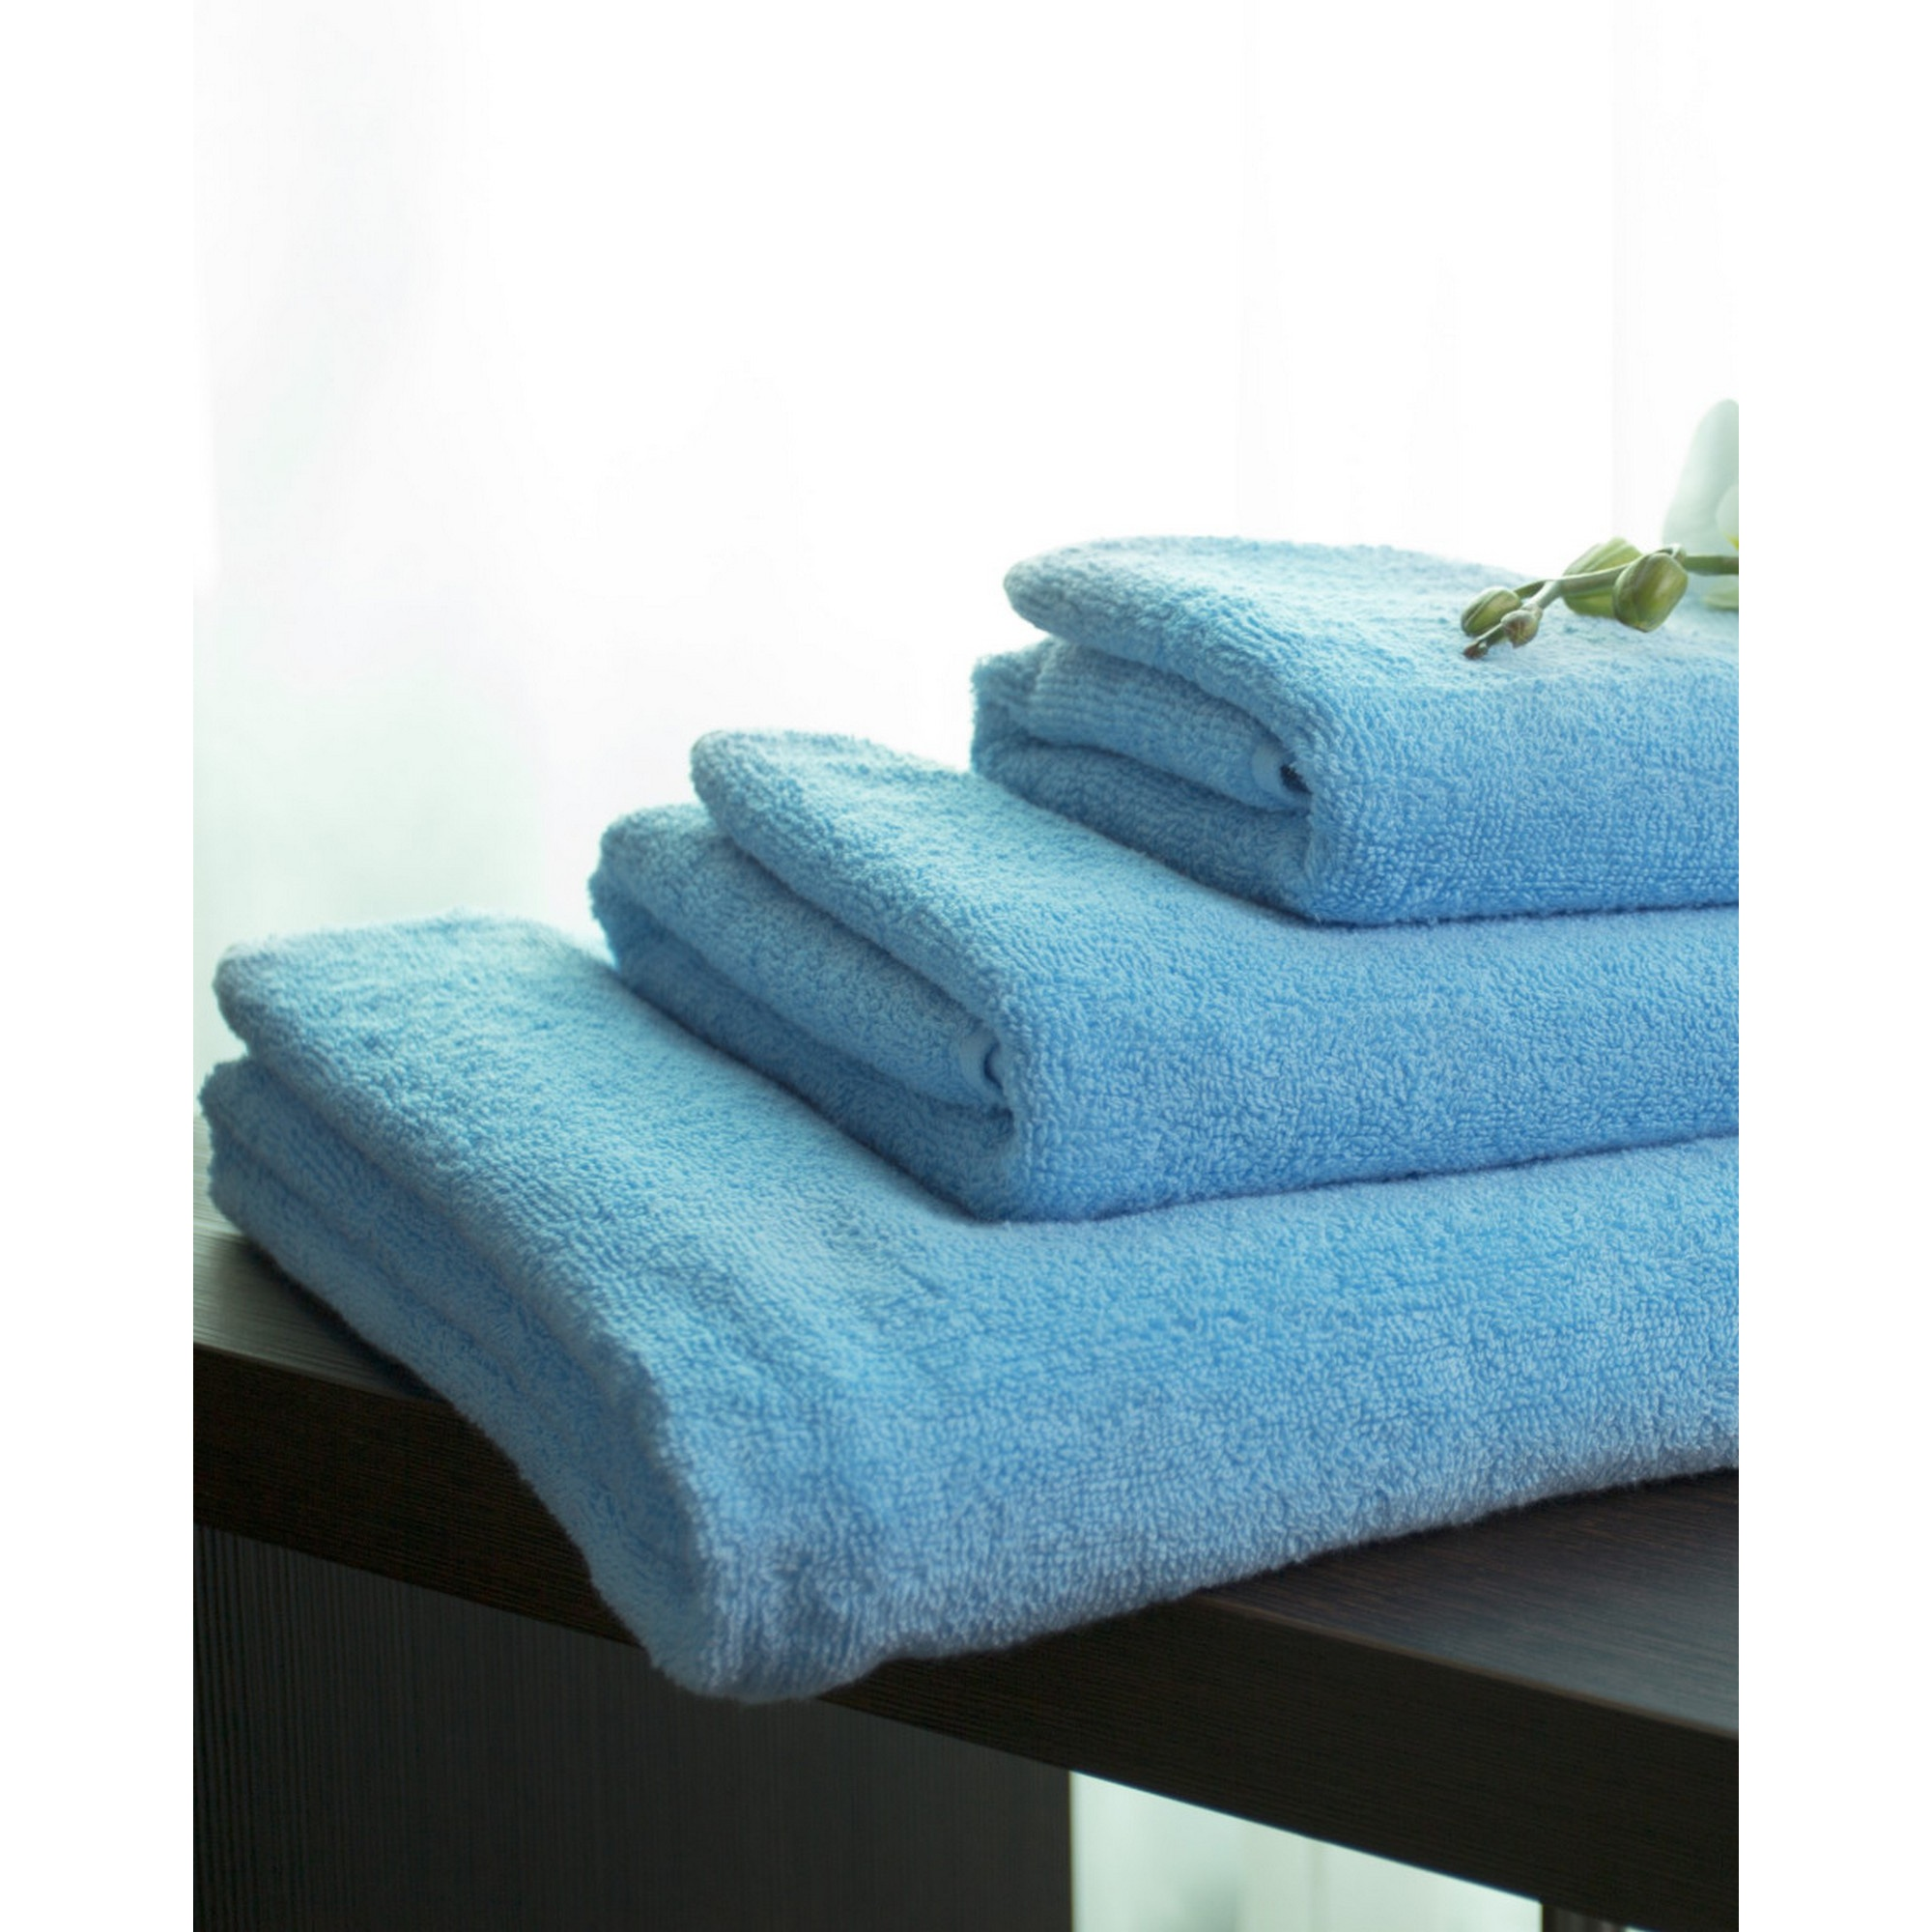 Jassz-Towels-Toalla-de-playa-modelo-Tiber-BC3896